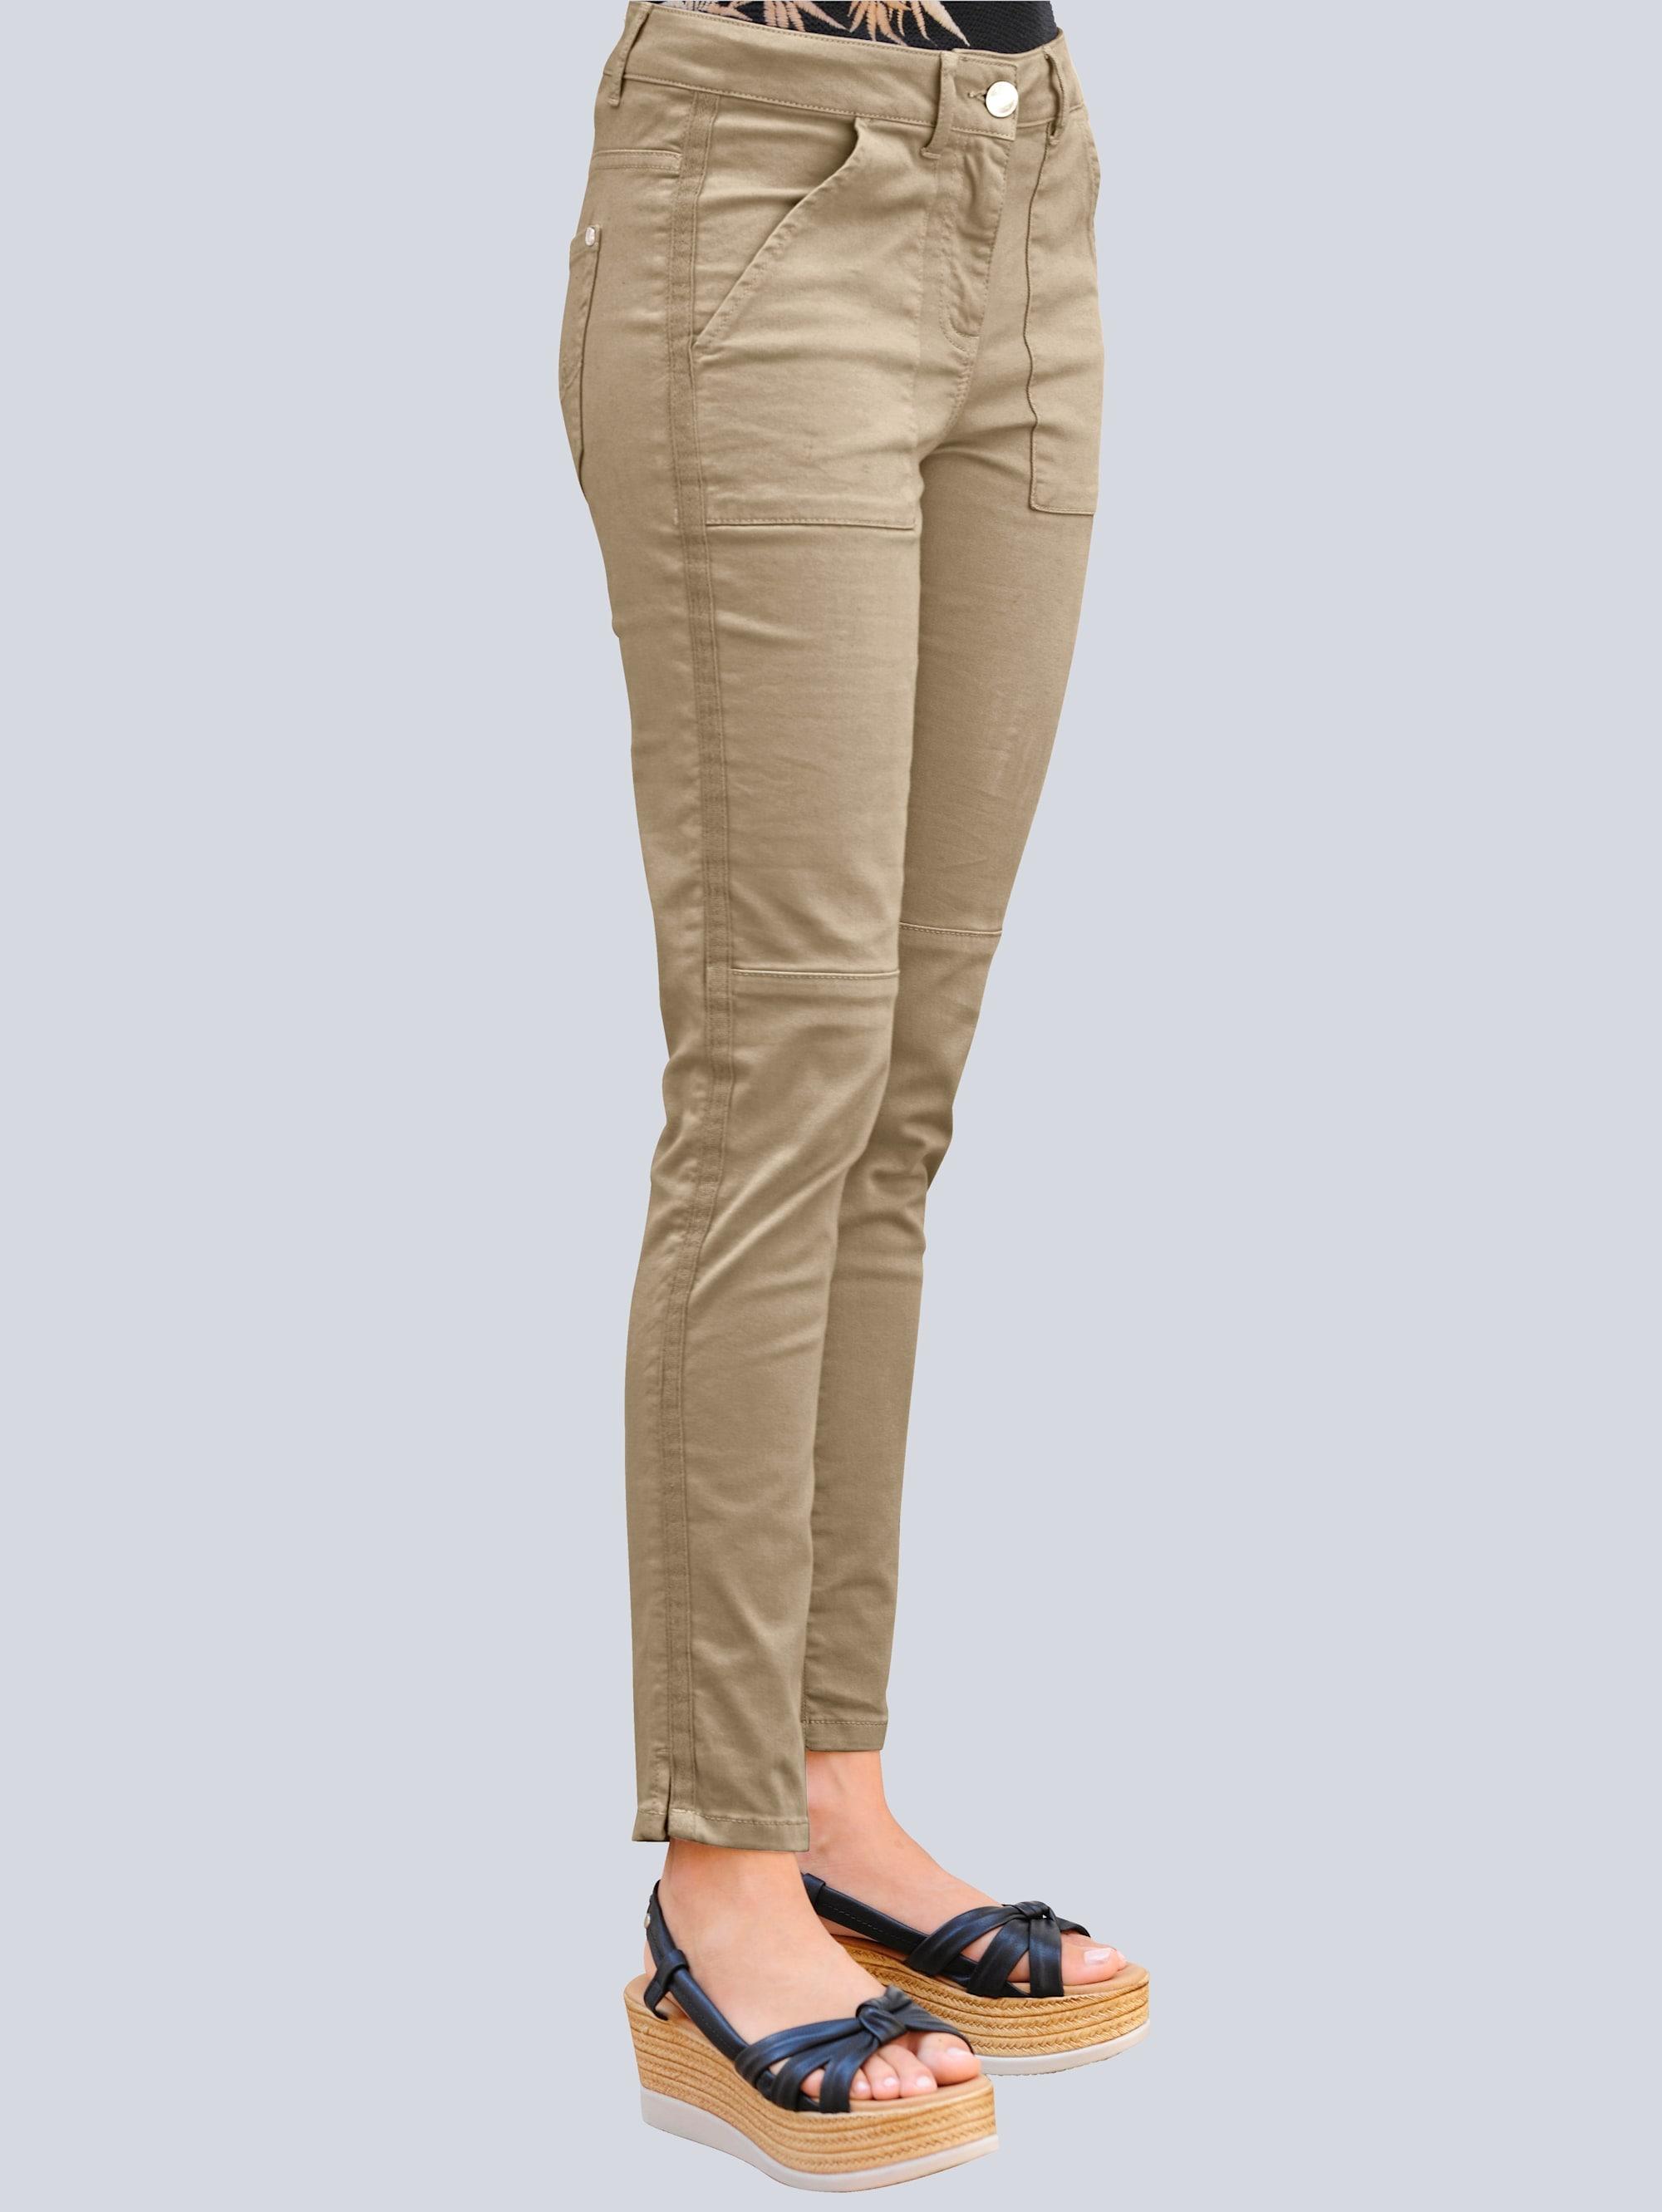 alba moda -  Stoffhose, mit Ripsband entlang der Seitennaht